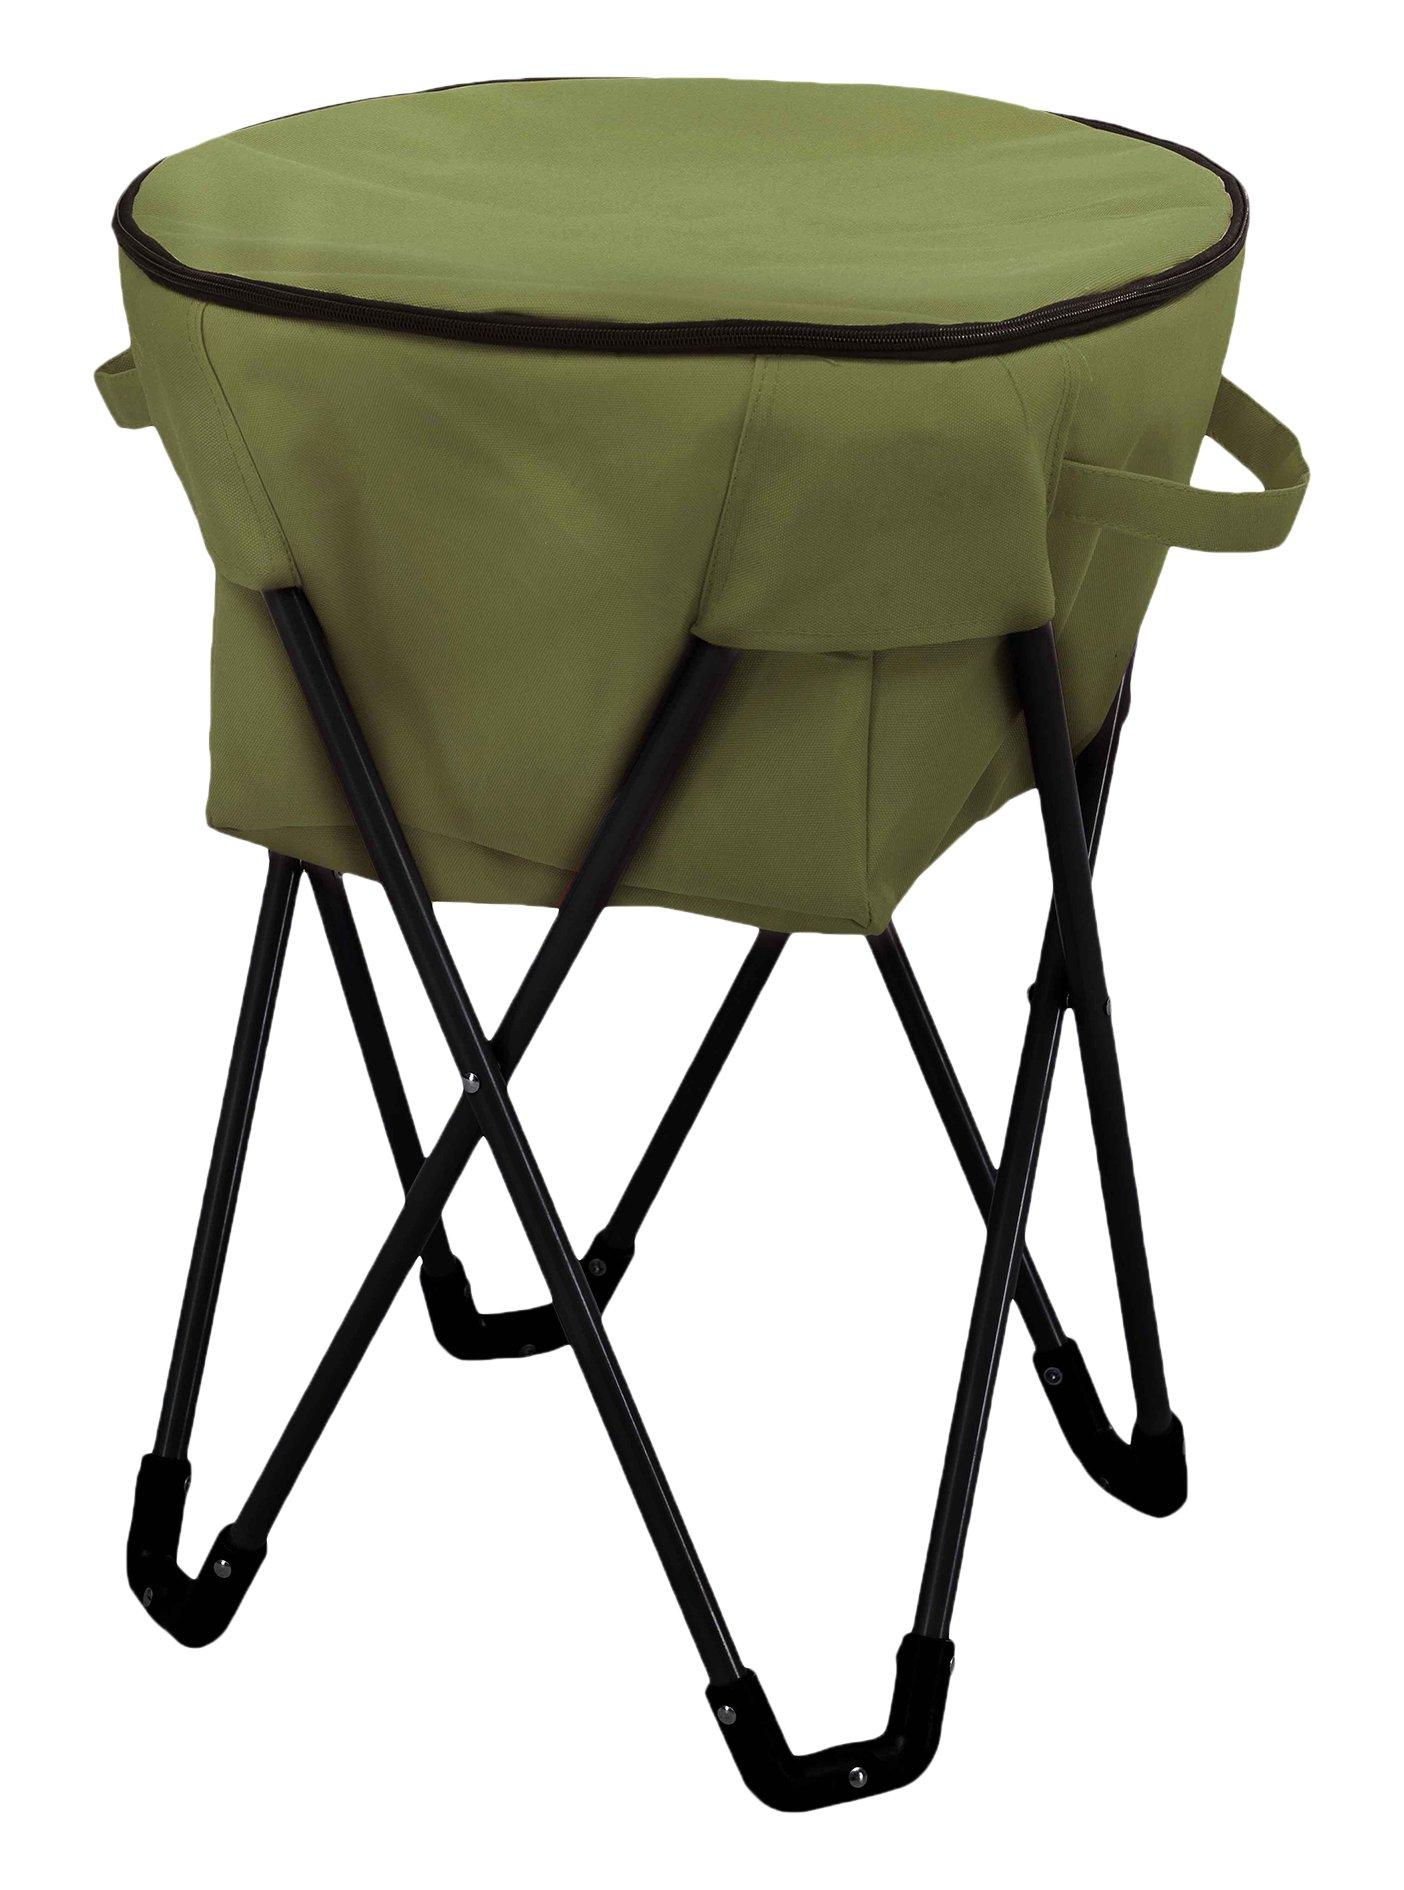 Sunjoy Folding Frame Outdoor Ice Cooler Bag, green